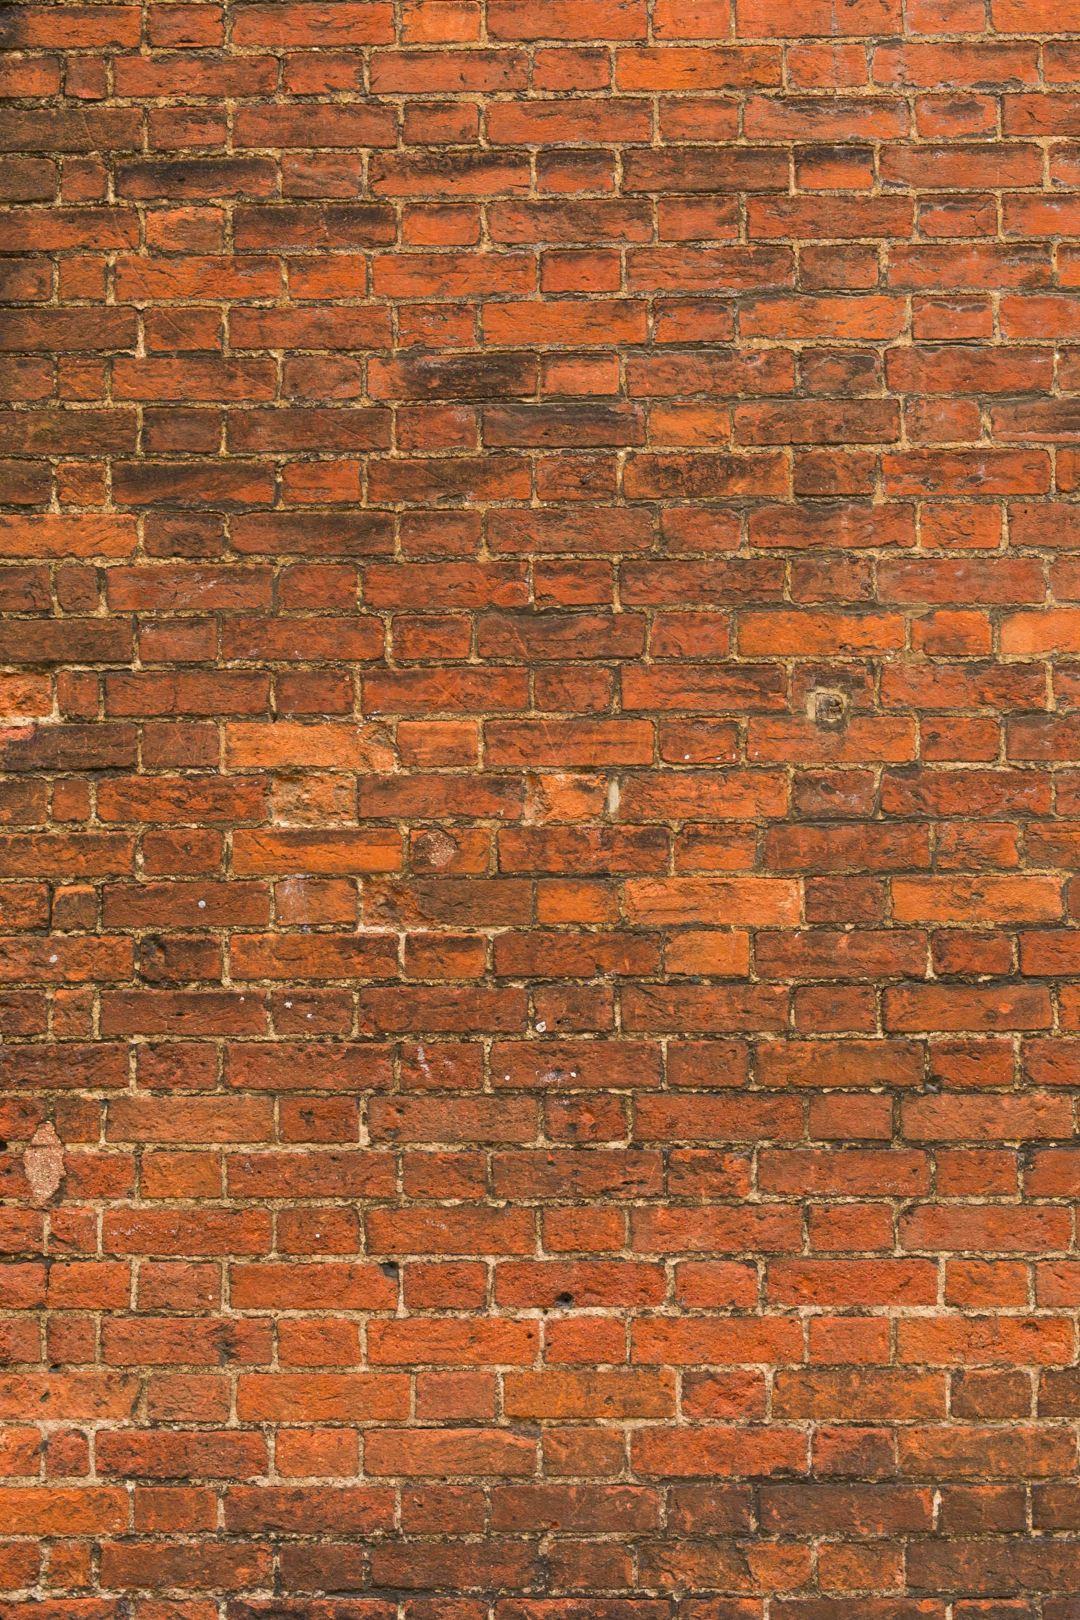 Oxford Brick Wall Photo By Kristina Kashtanova